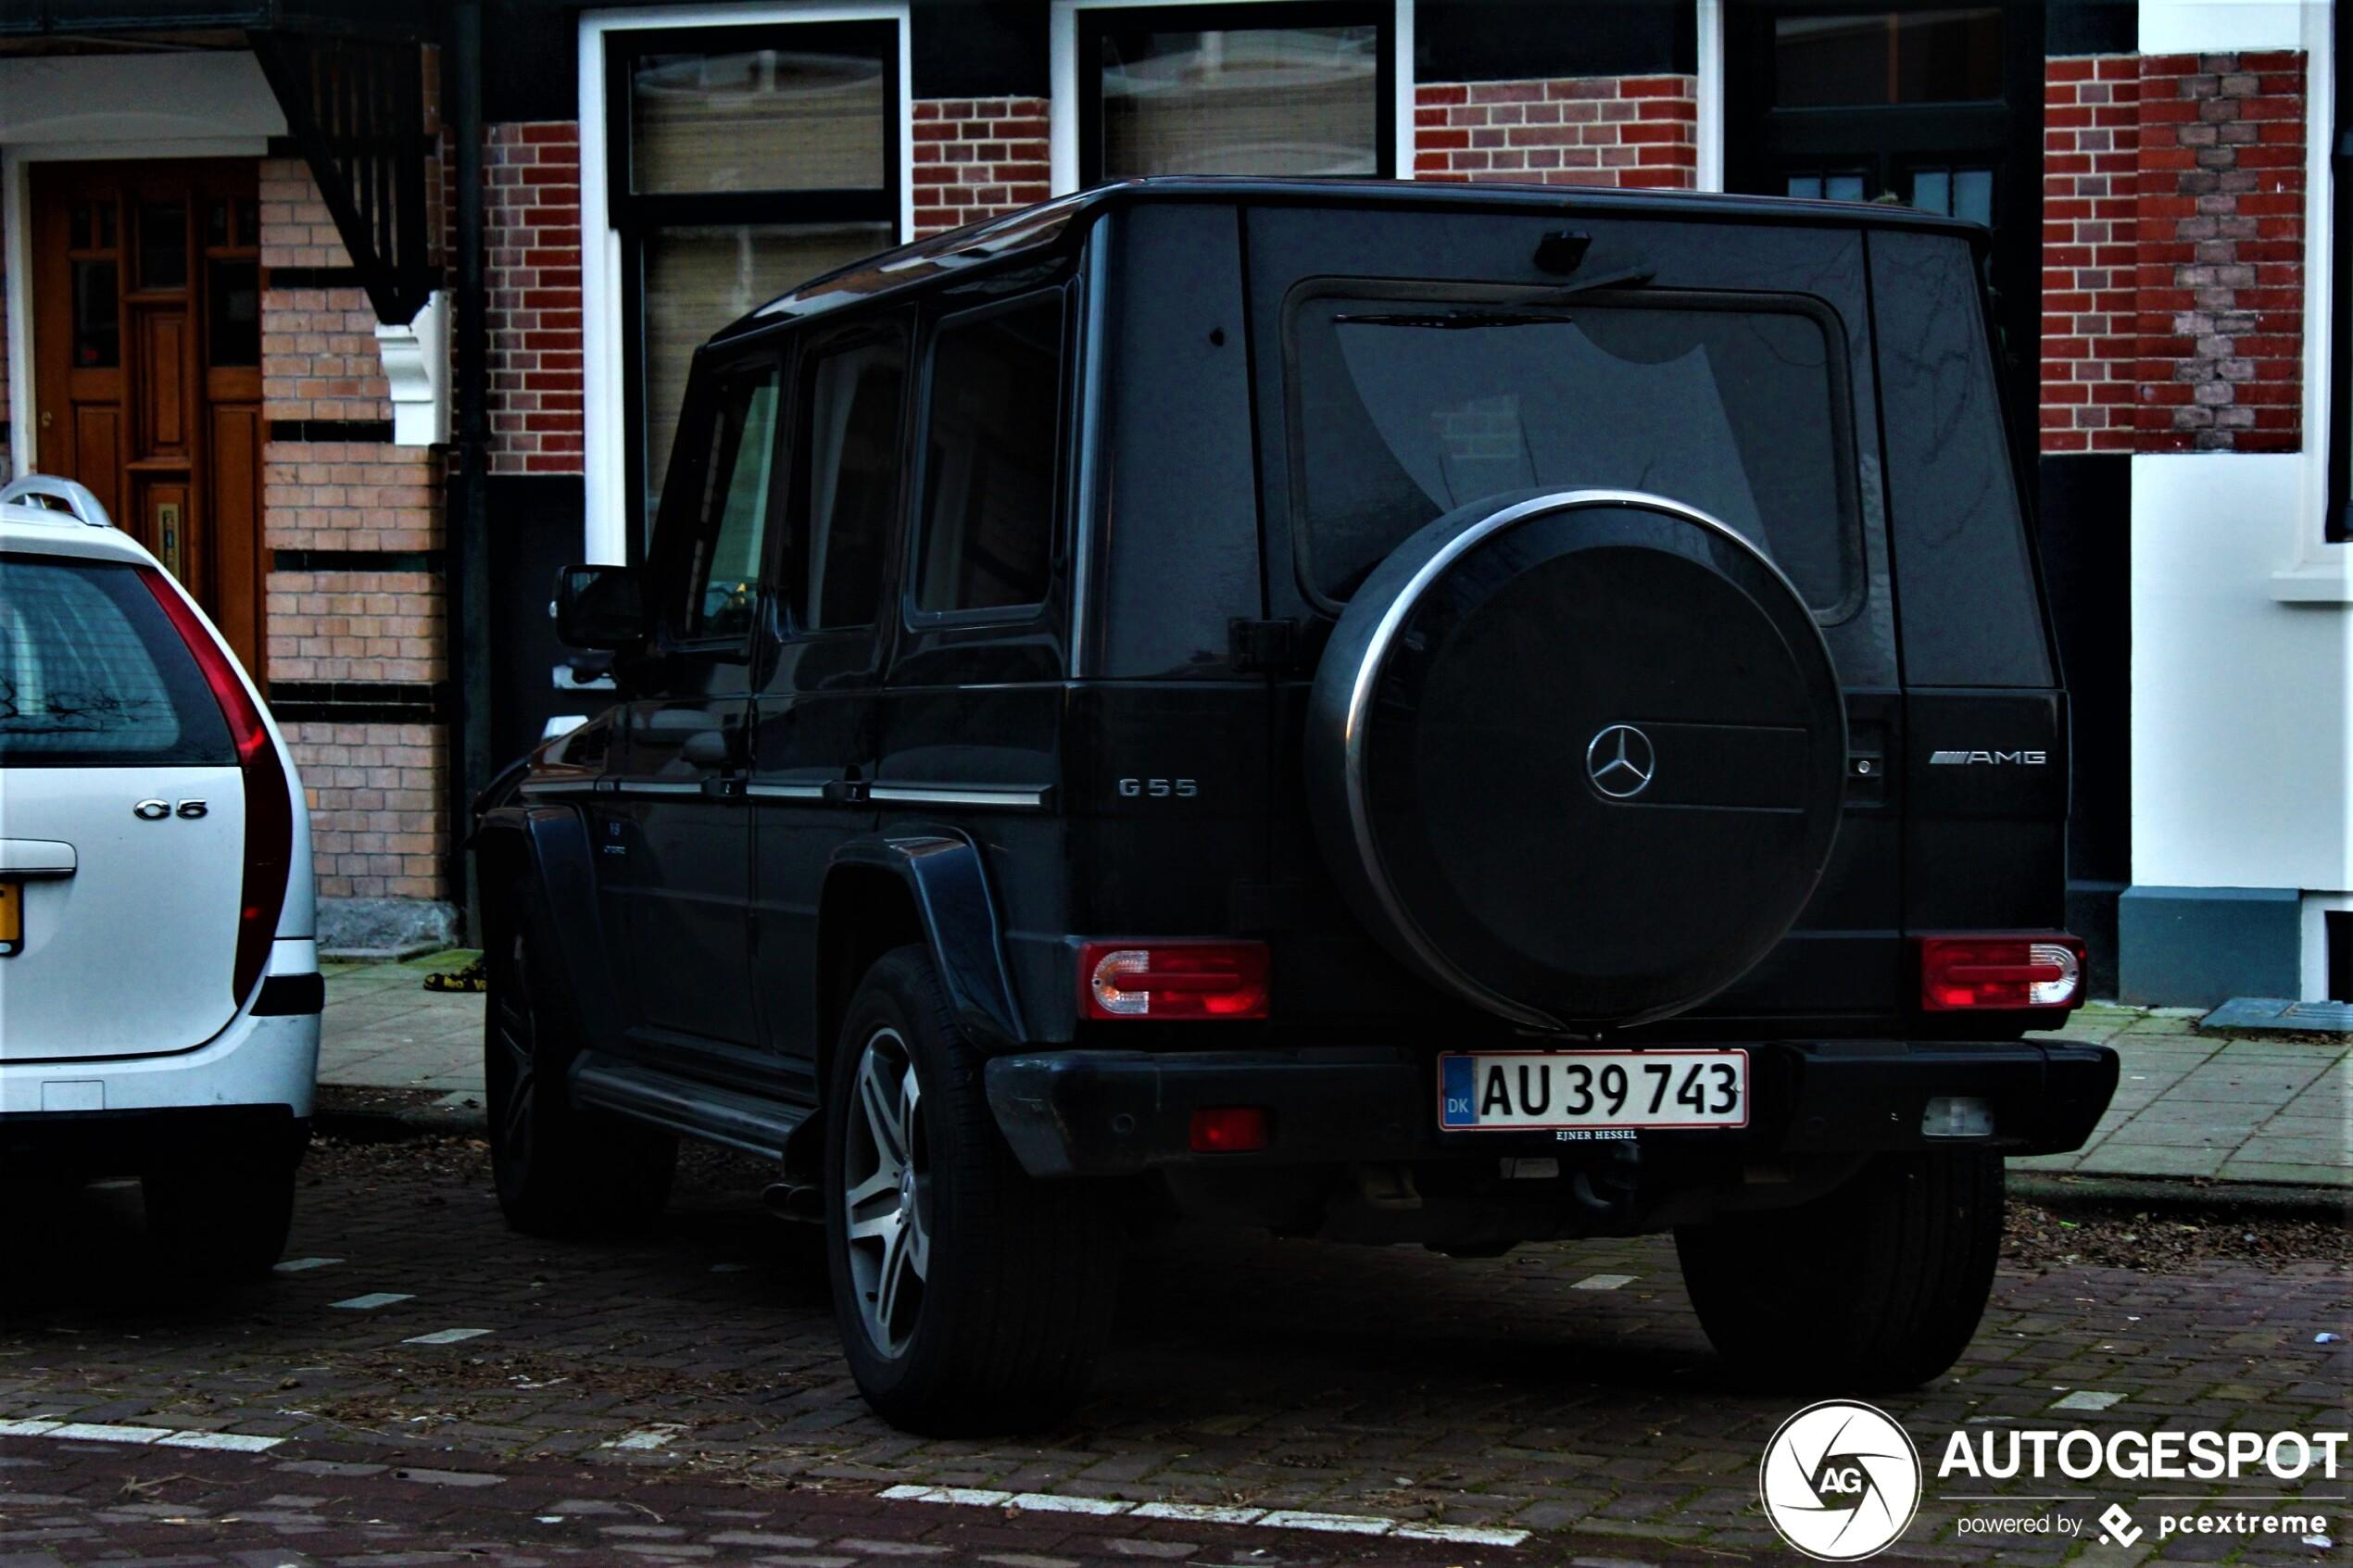 Mercedes-Benz G 55 AMG 2002